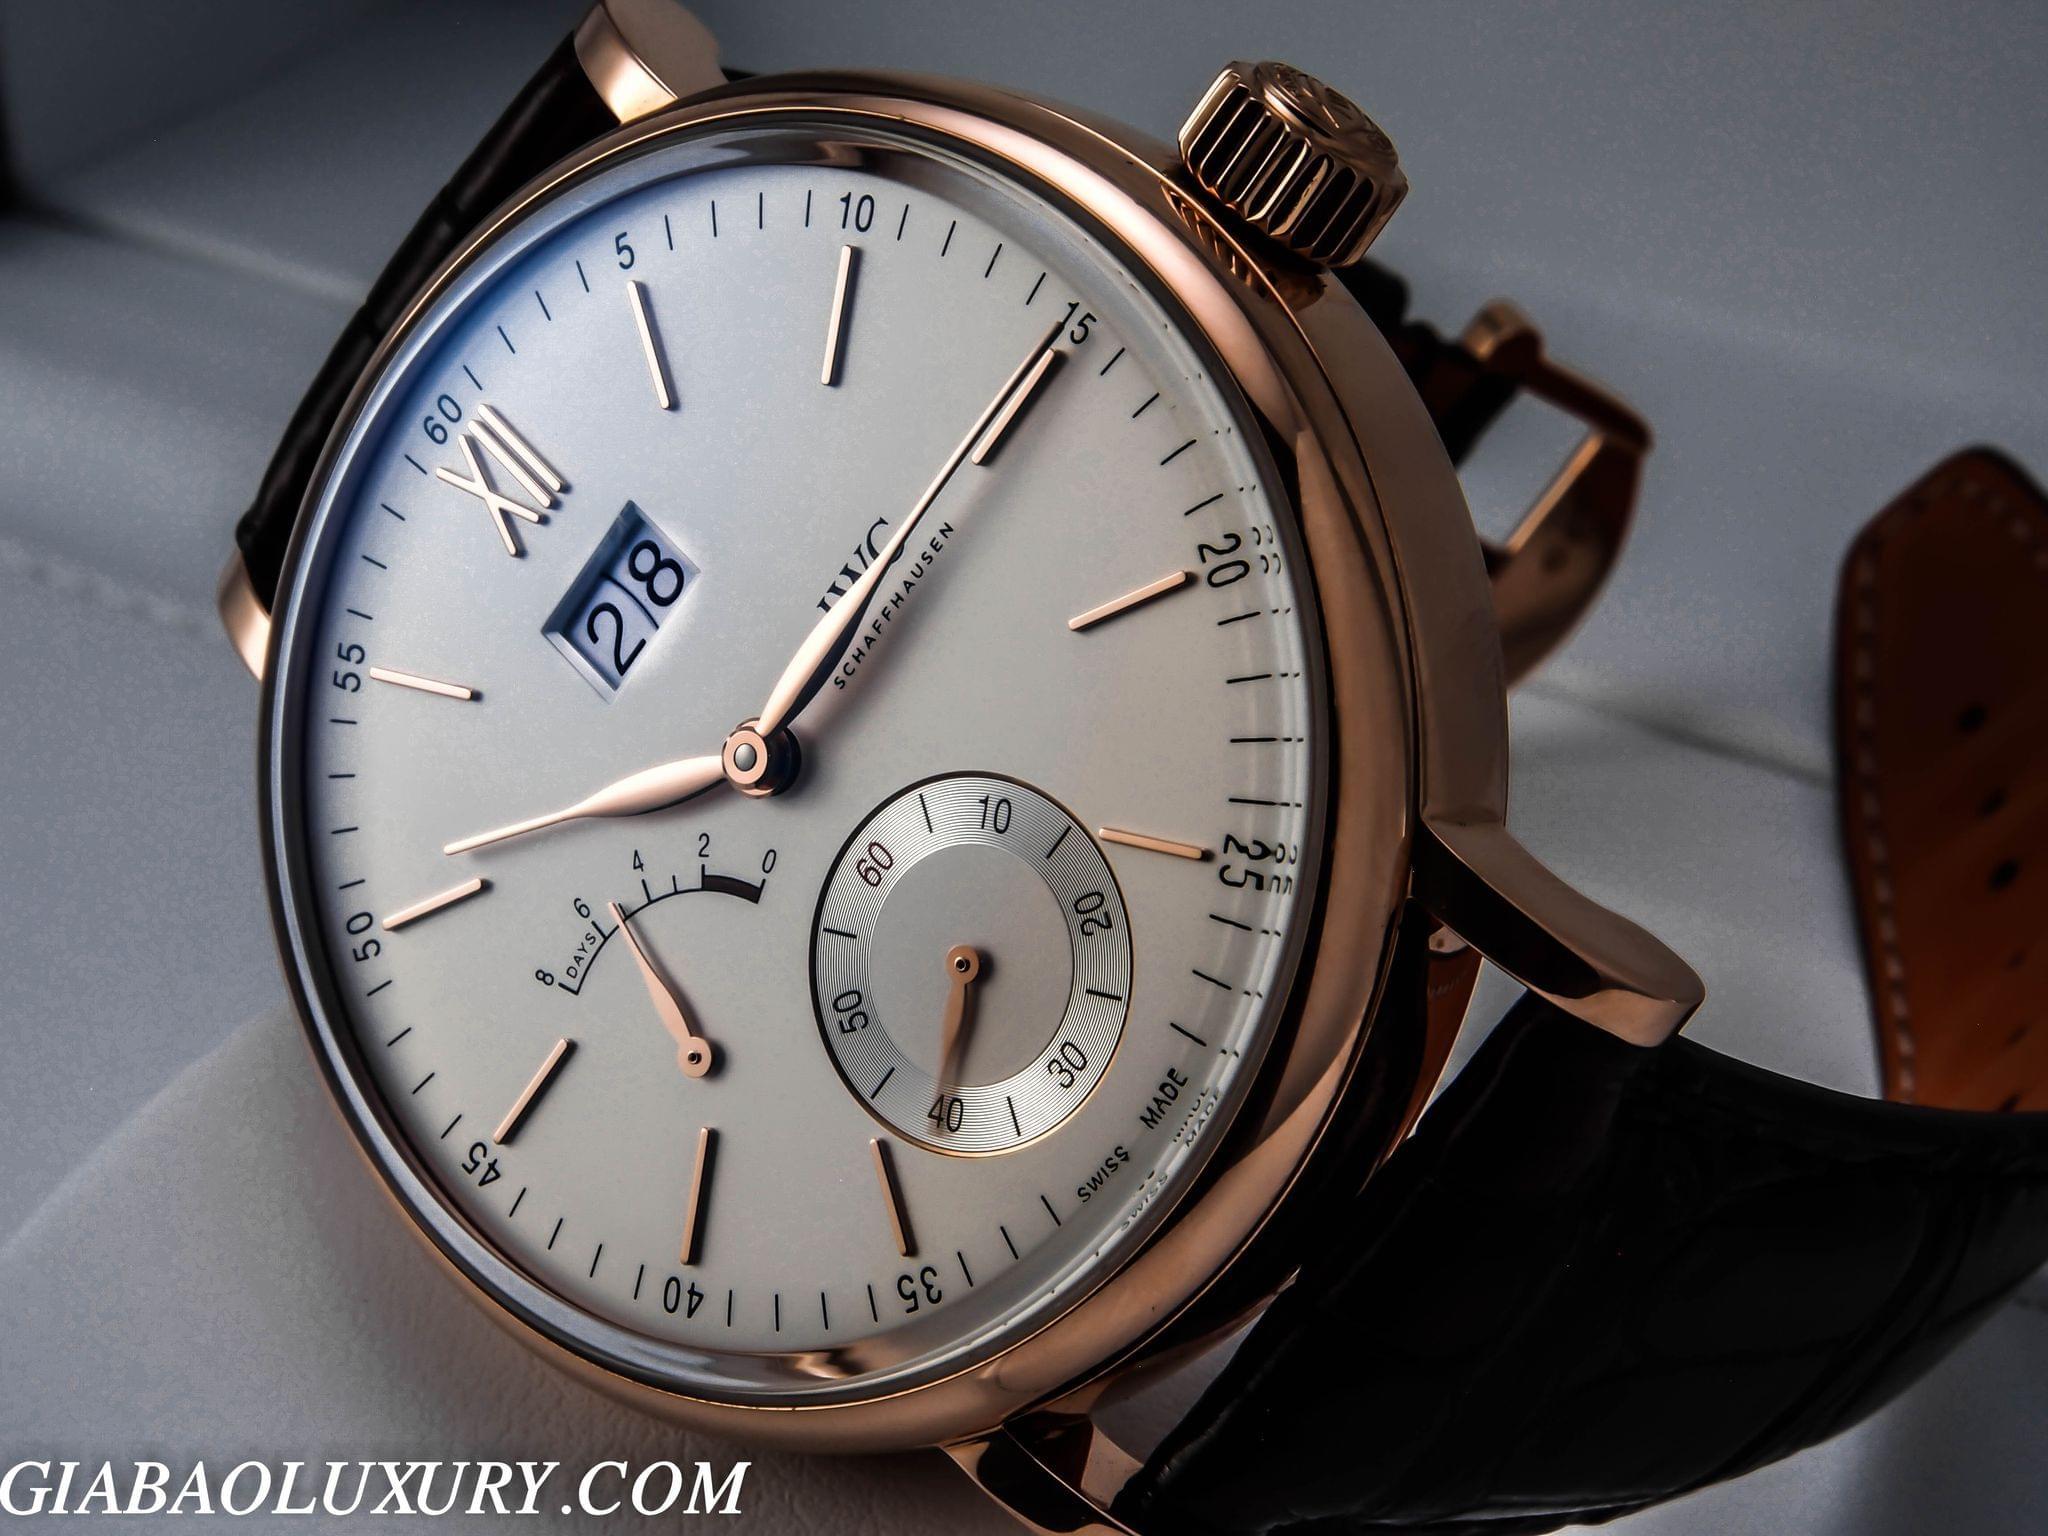 đồng hồ IWC Portofino 1